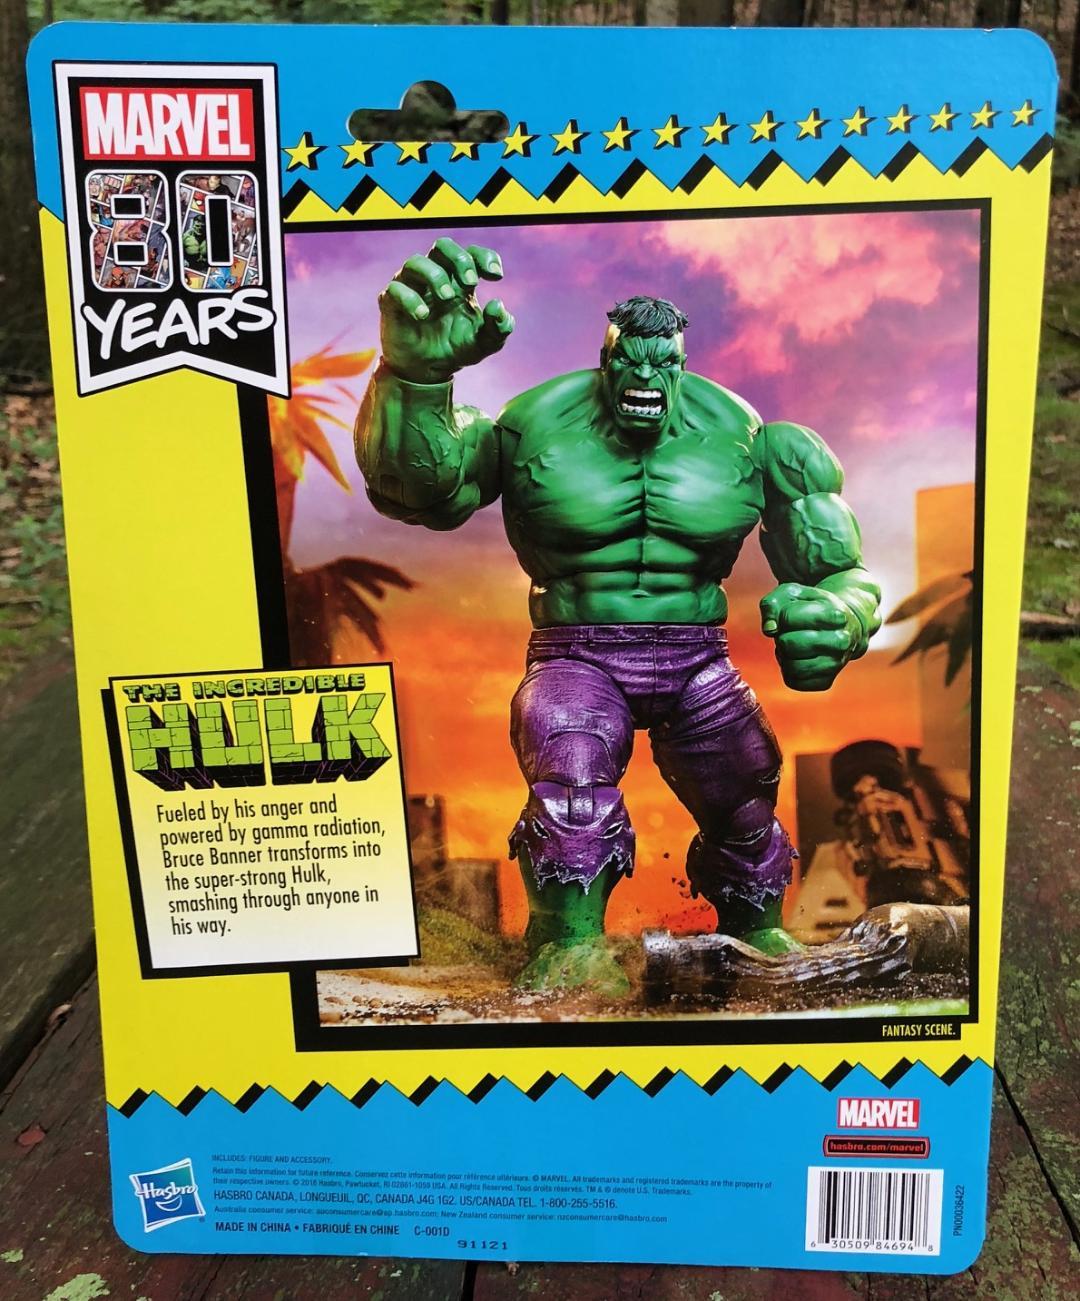 REVIEW: SDCC 2019 Marvel Legends Exclusive Hulk Vintage Figure